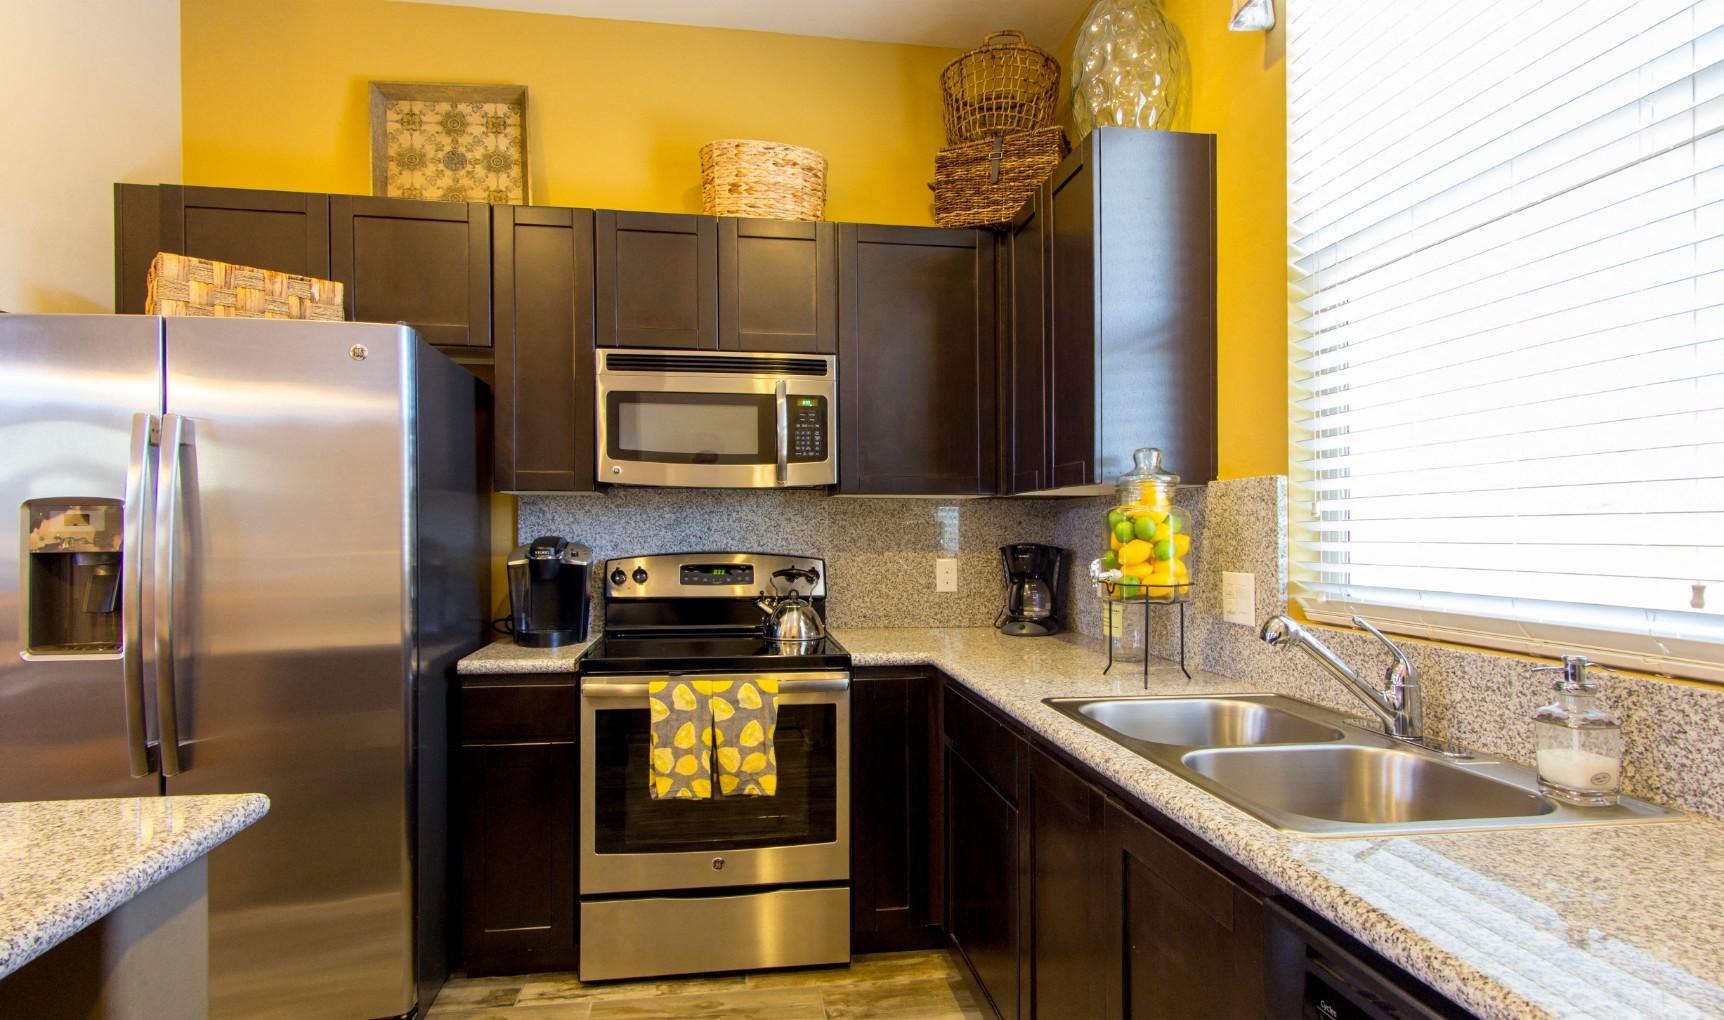 Apartments Near University of Arizona Sabino Vista Apartment Homes for University of Arizona Students in Tucson, AZ